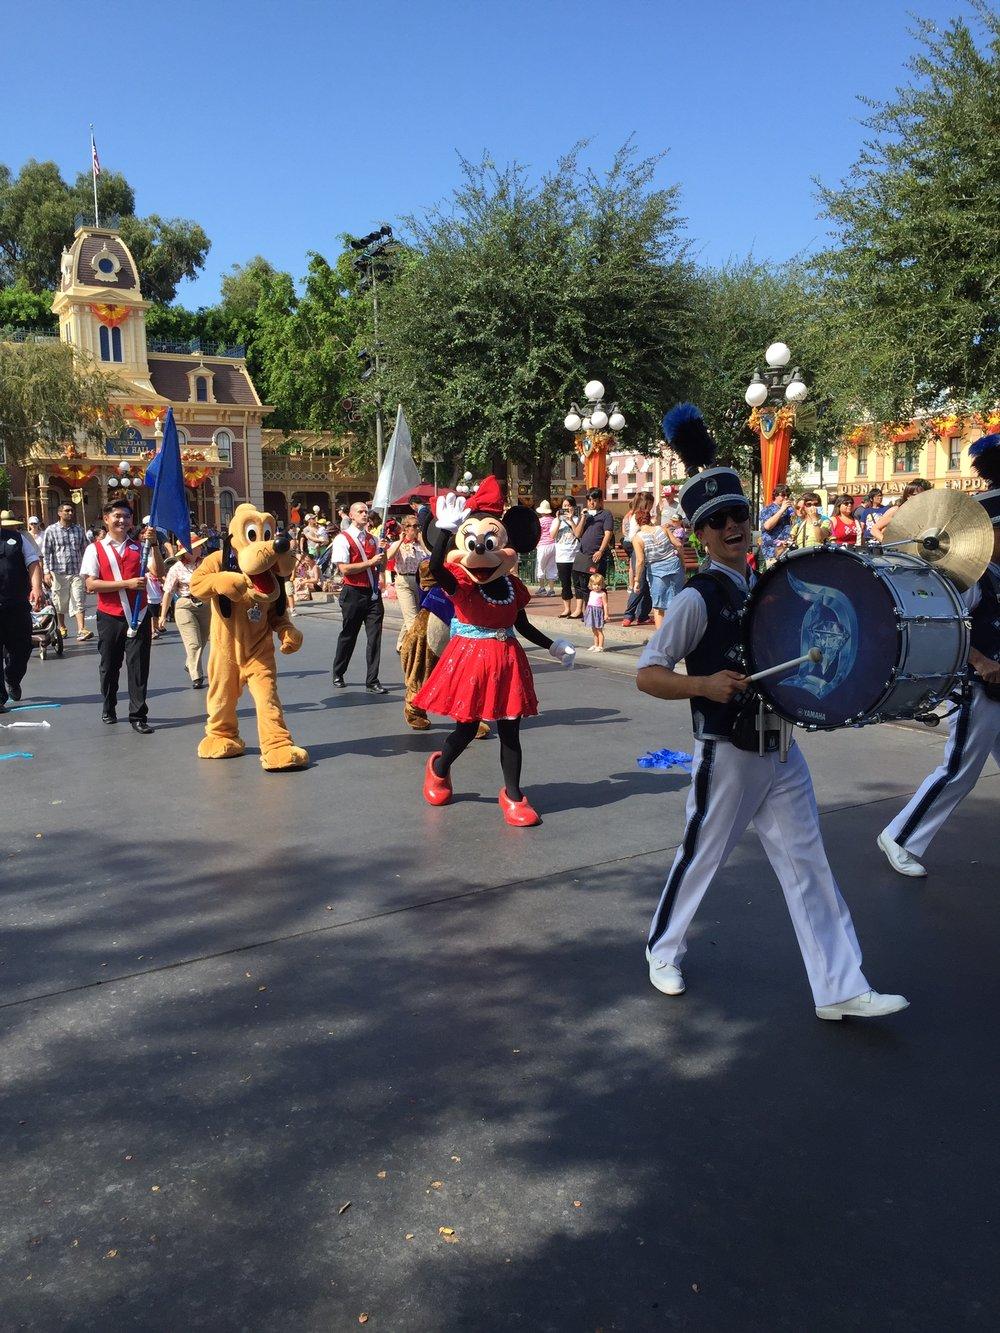 The Magic of Disneyland, Disneyland, Disney, Family Fun, Family Vacation, California Adventure, The Everyday Journalista, Everyday Journalista, Memories, Olaf, Minnie Mouse, It's a Small World, Storybookland canal boats, Sleeping Beauty Castle walkthrough